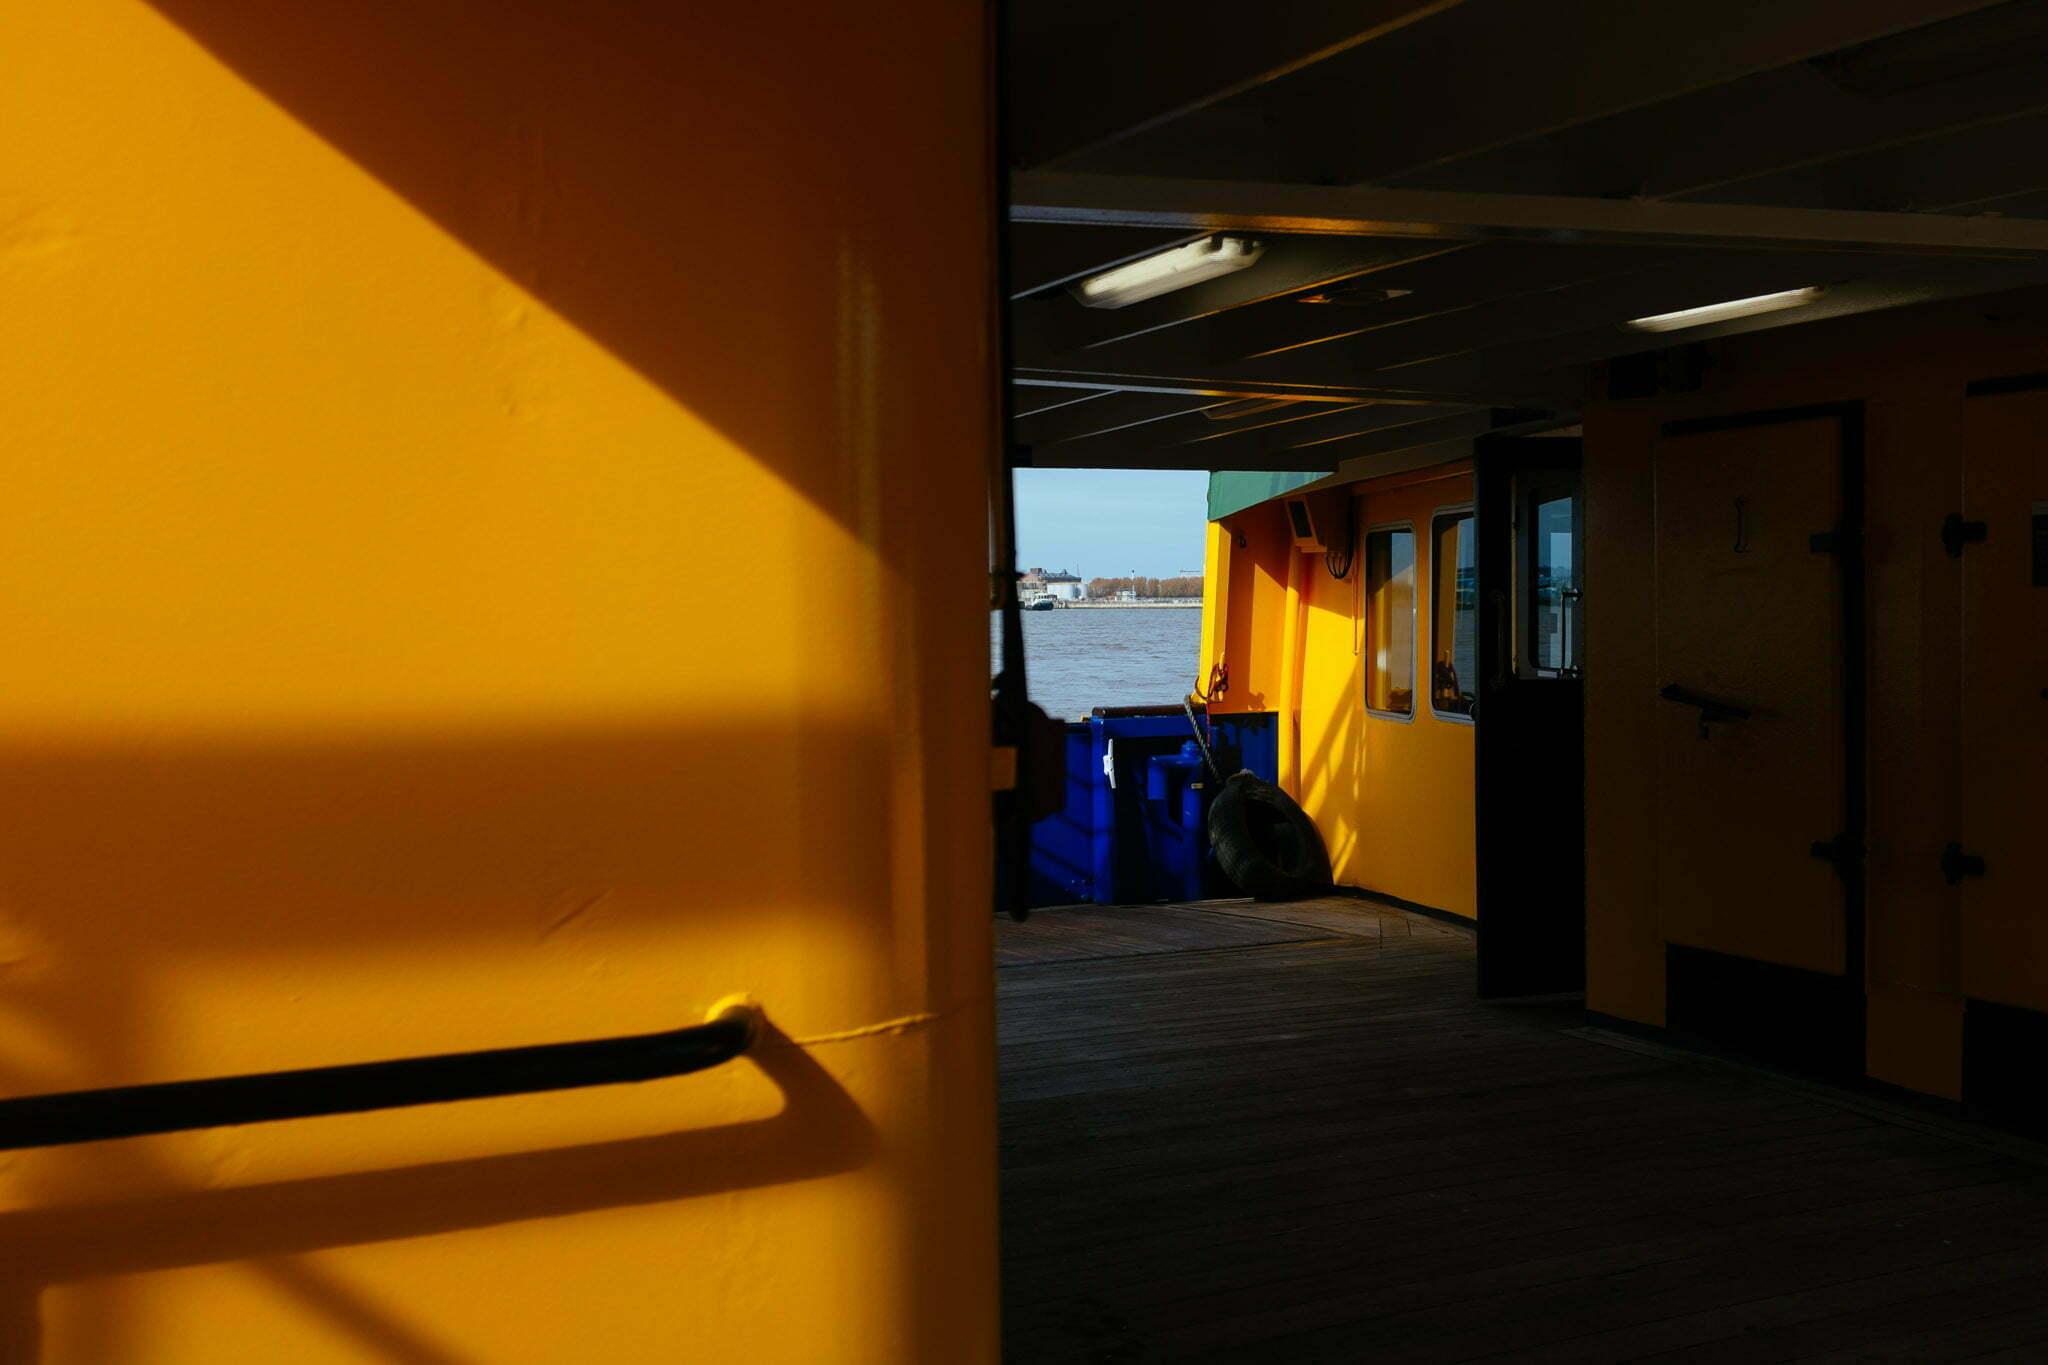 dazzle-ferry-liverpool-6306